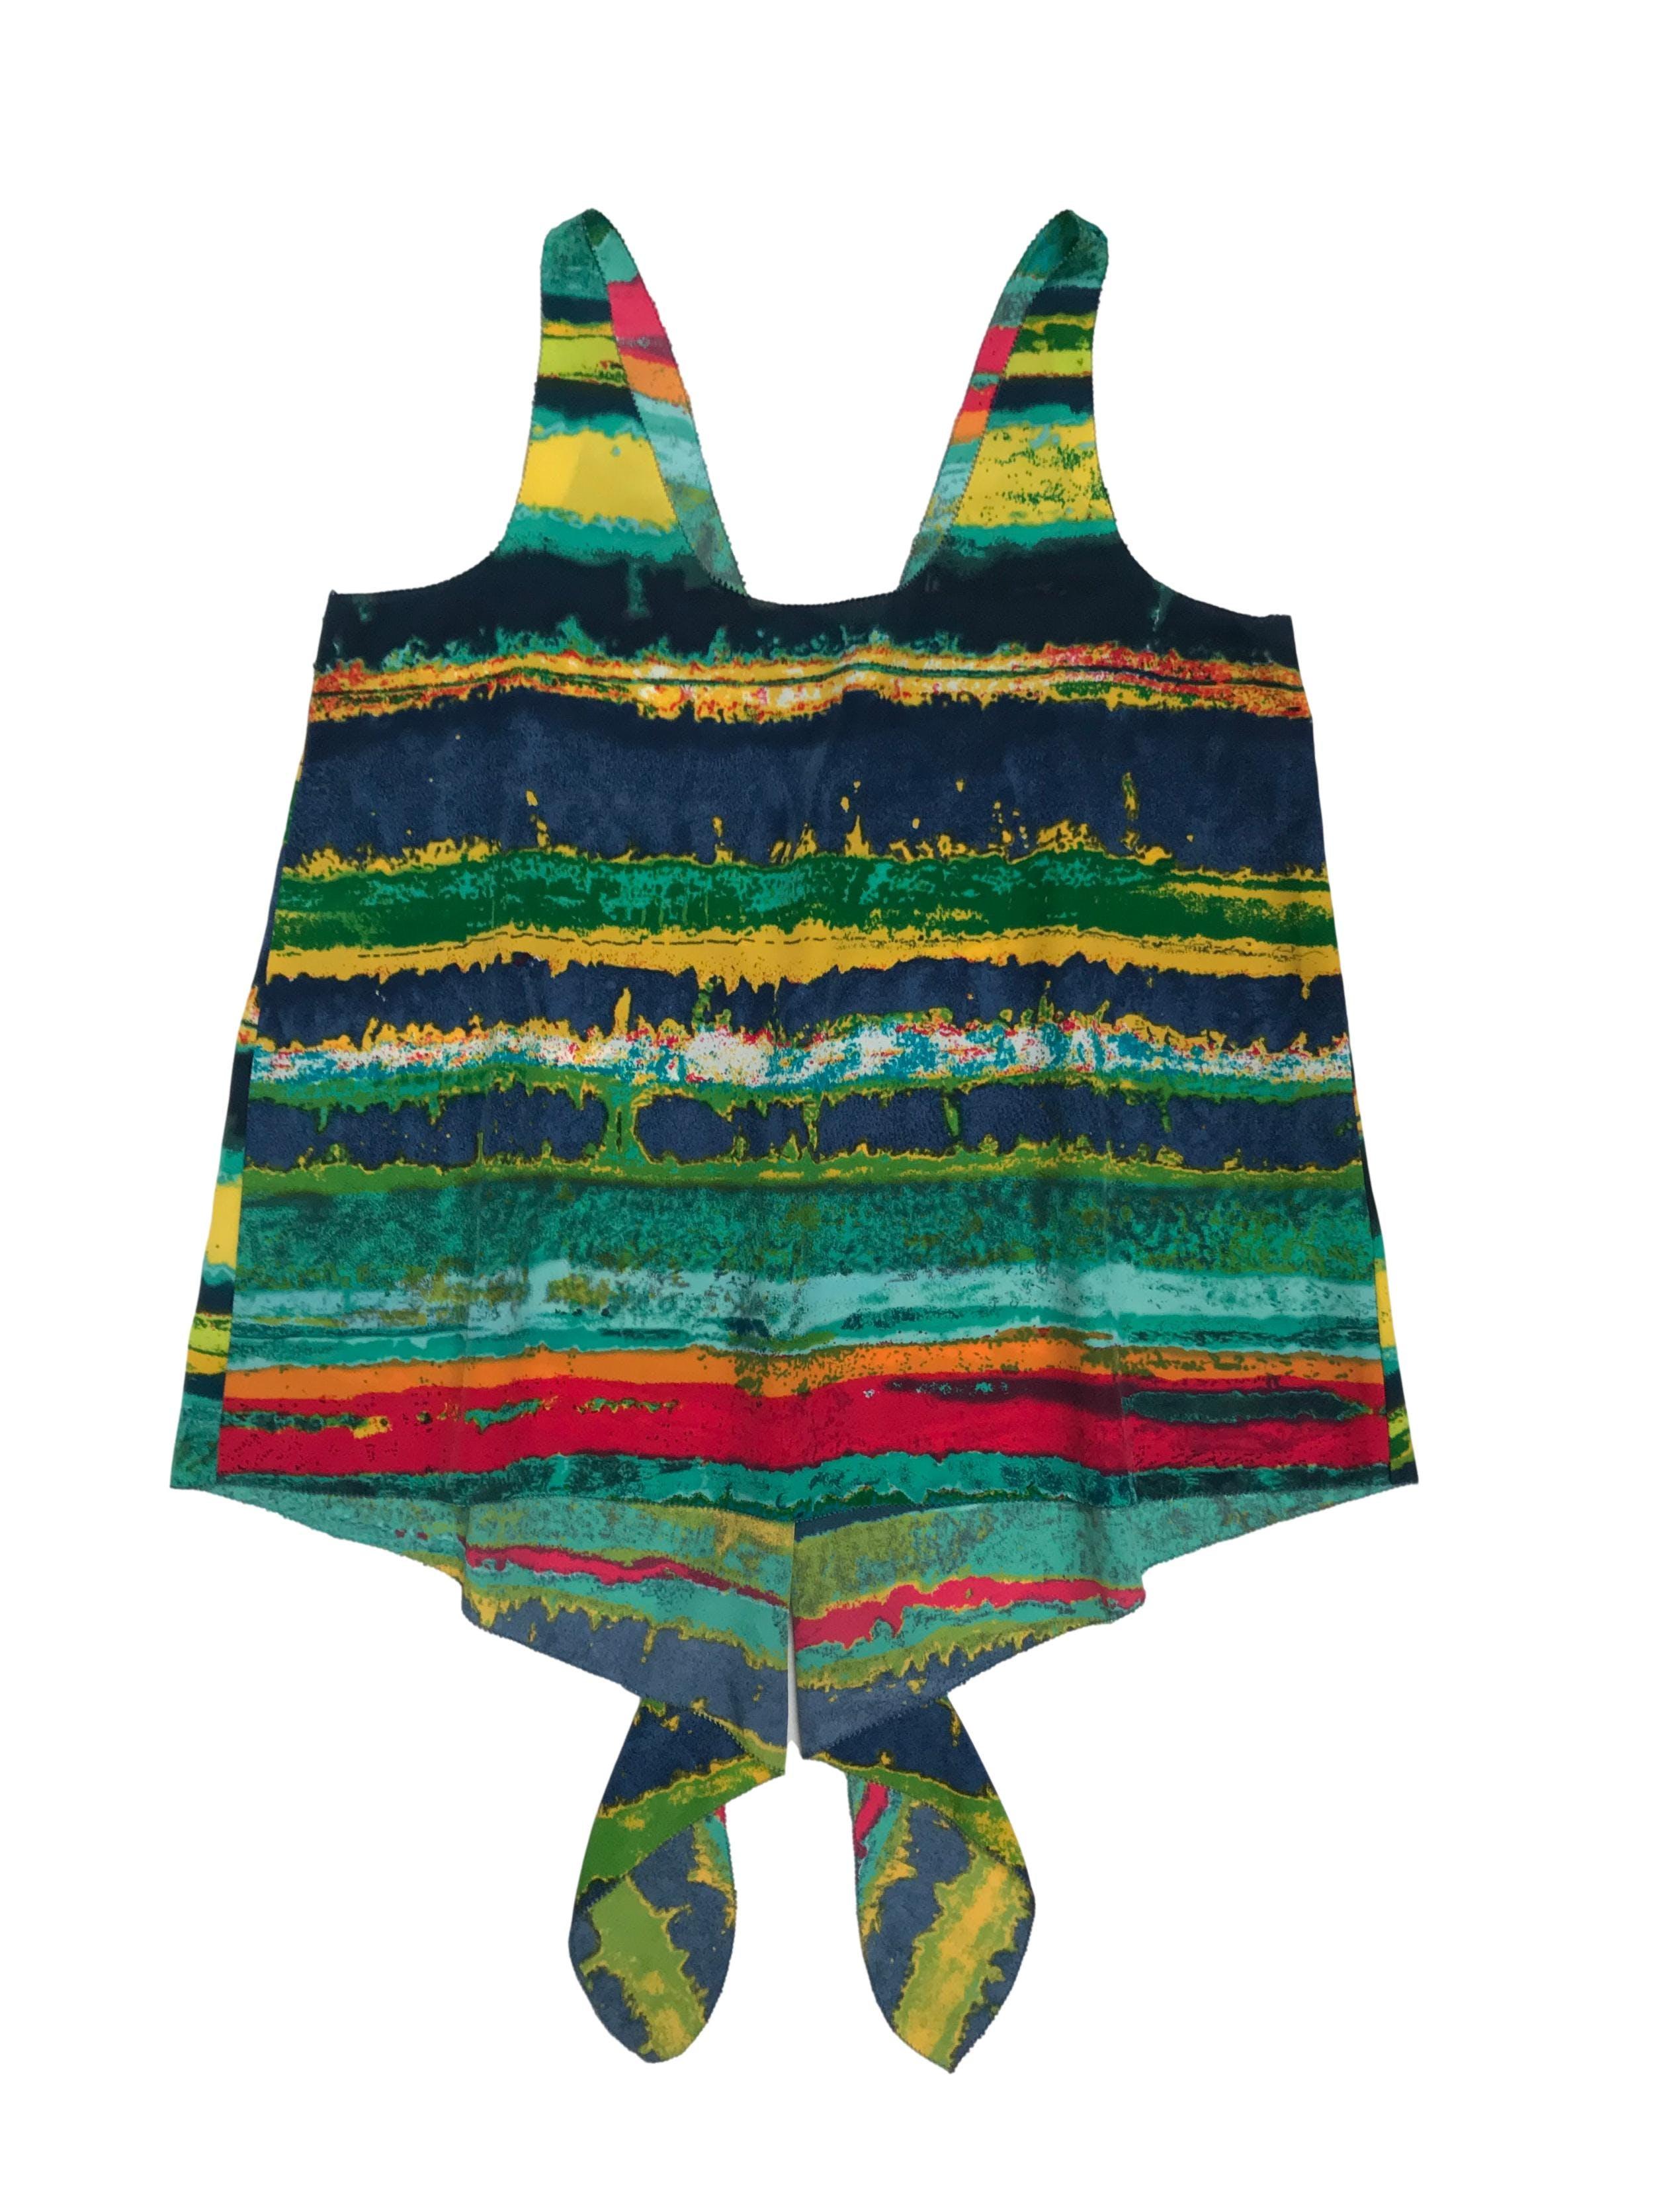 Blusa de tela plana multicolor con basta asimétrica larga atrás